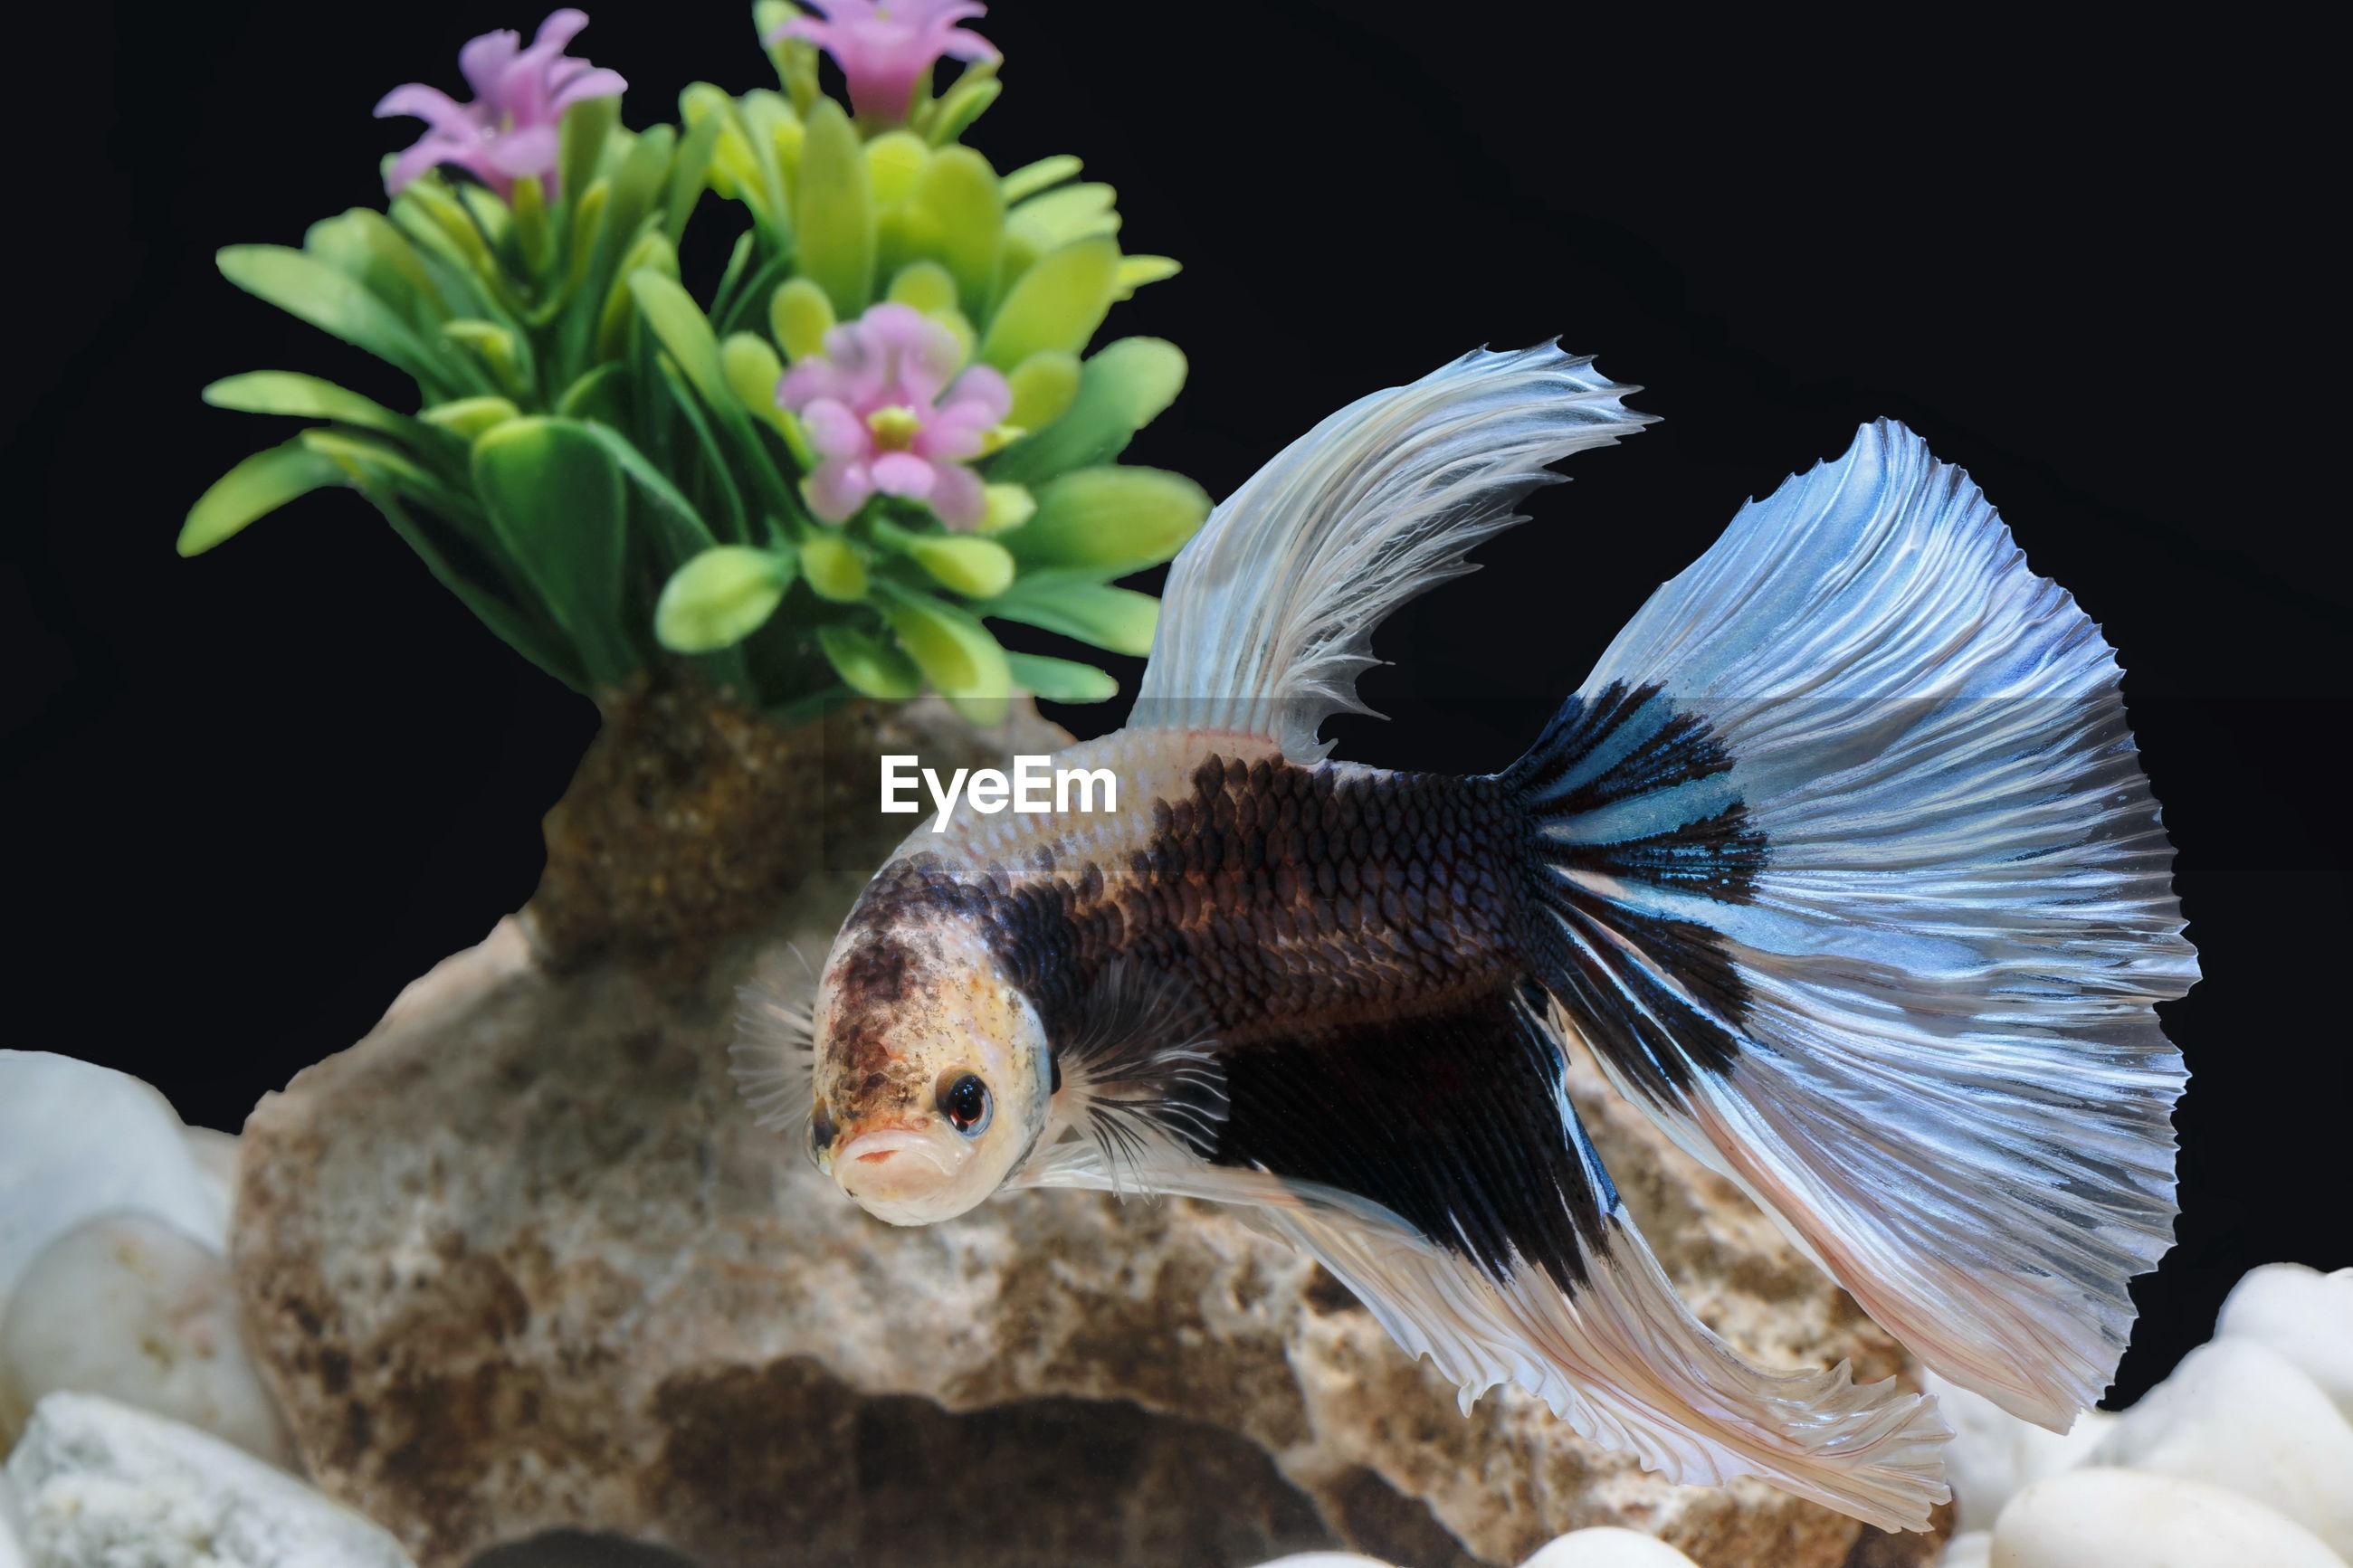 Siamese fighting fish, betta splendens, colorful fish on a black background, halfmoon betta.